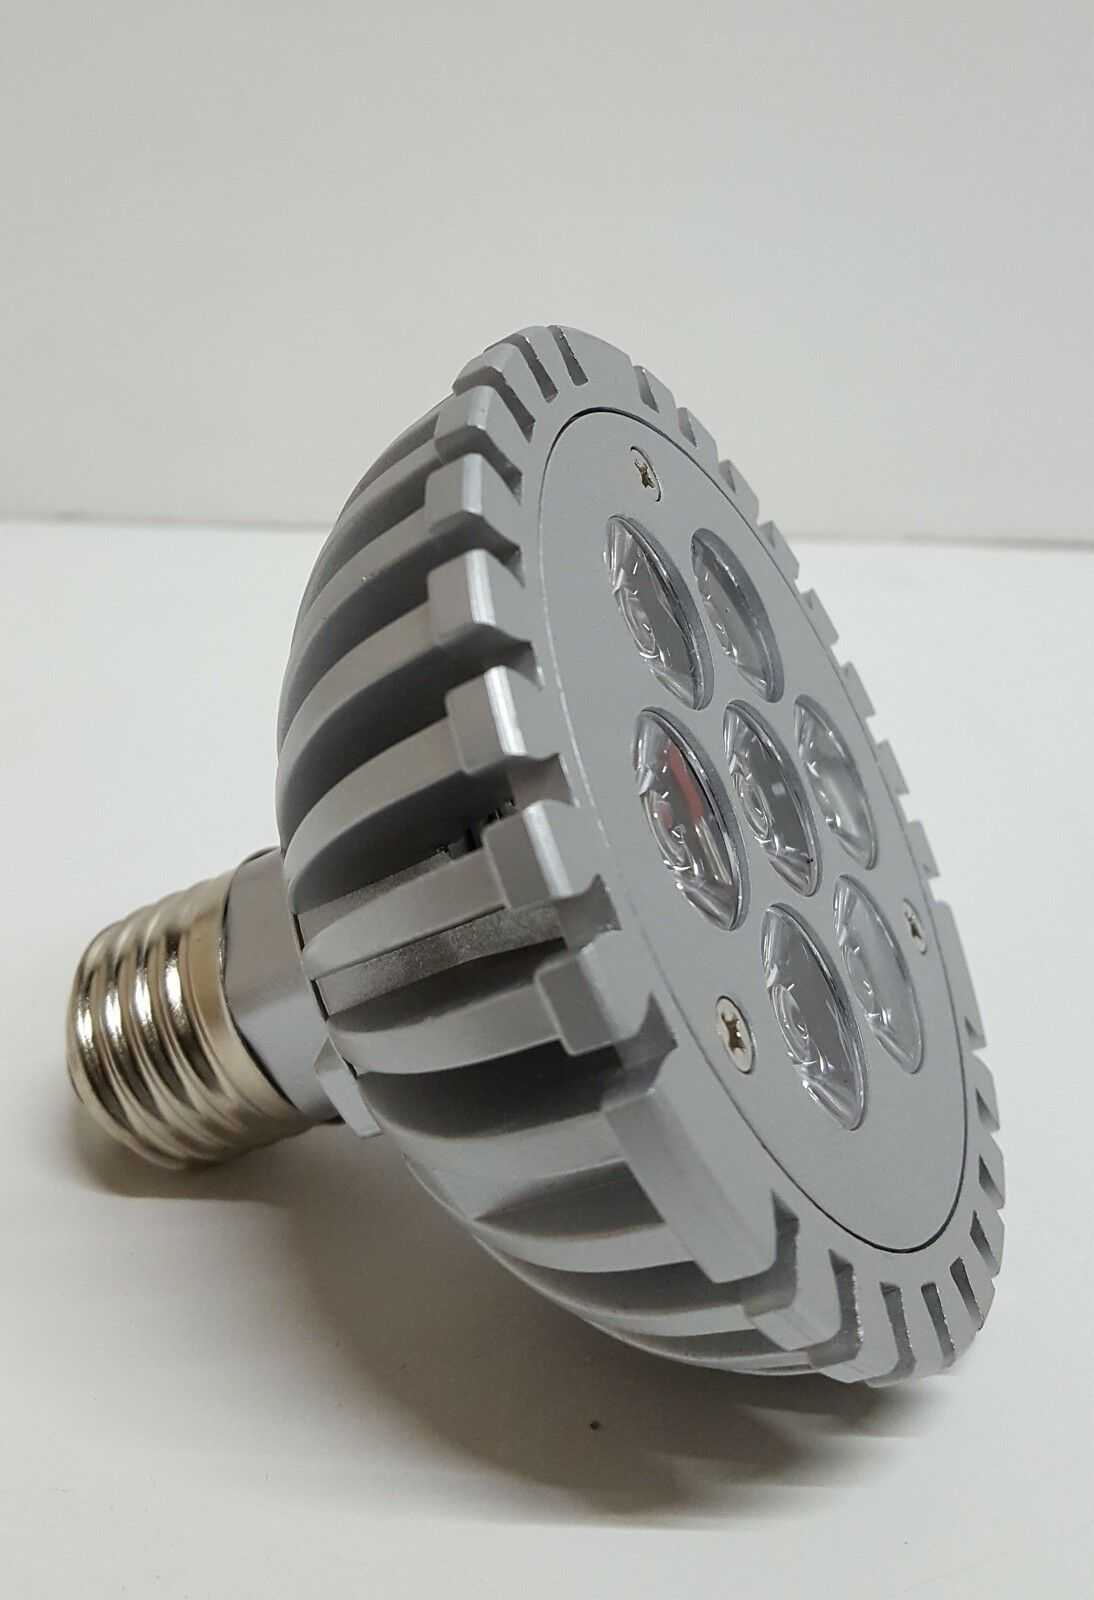 E27 Grow Light Mains PAR30 7W Blue LED Lamp Bulb Floodlight Energy Saving